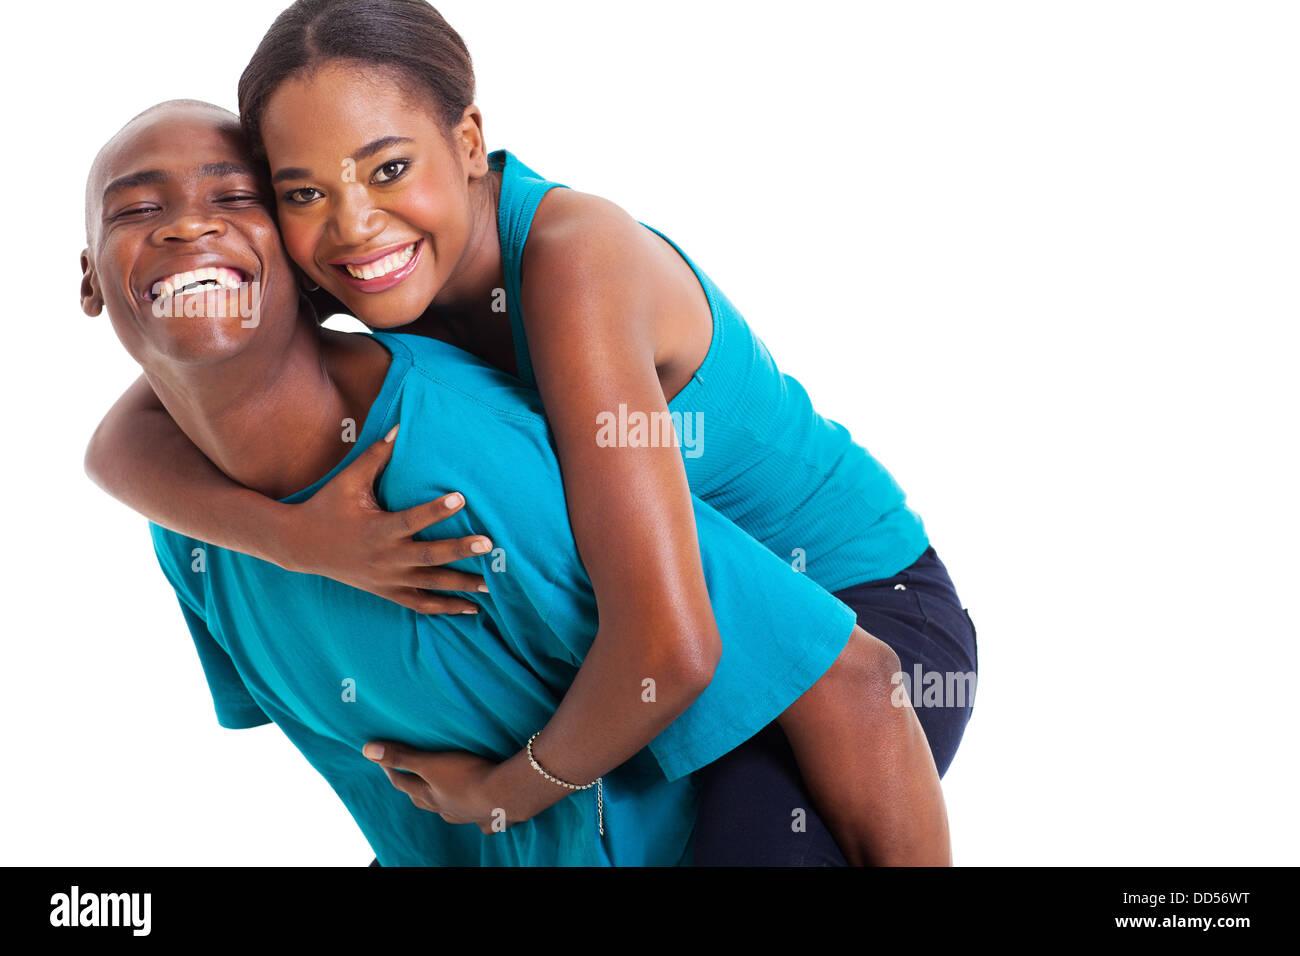 cheerful African woman enjoying piggyback ride on boyfriends back isolated on white - Stock Image